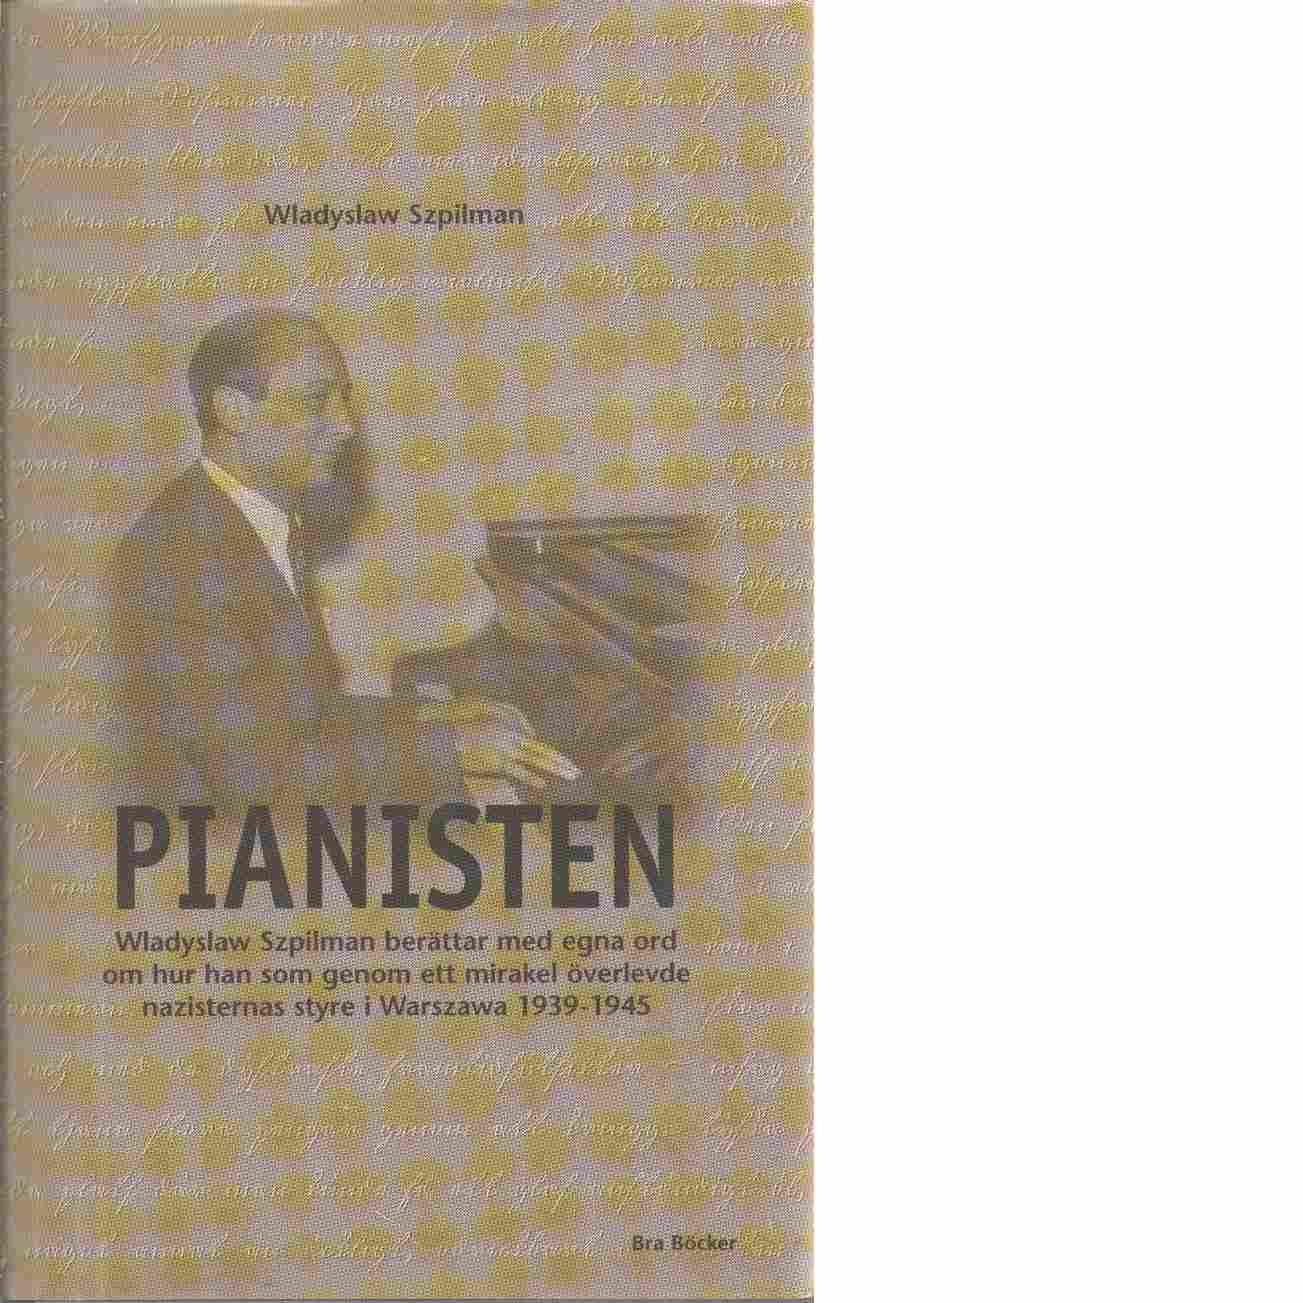 Pianisten / Wladyslaw Szpilman ; med utdrag ur den tyske officeren Wilm Hosenfelds dagbok - Szpilman, W³adys³aw